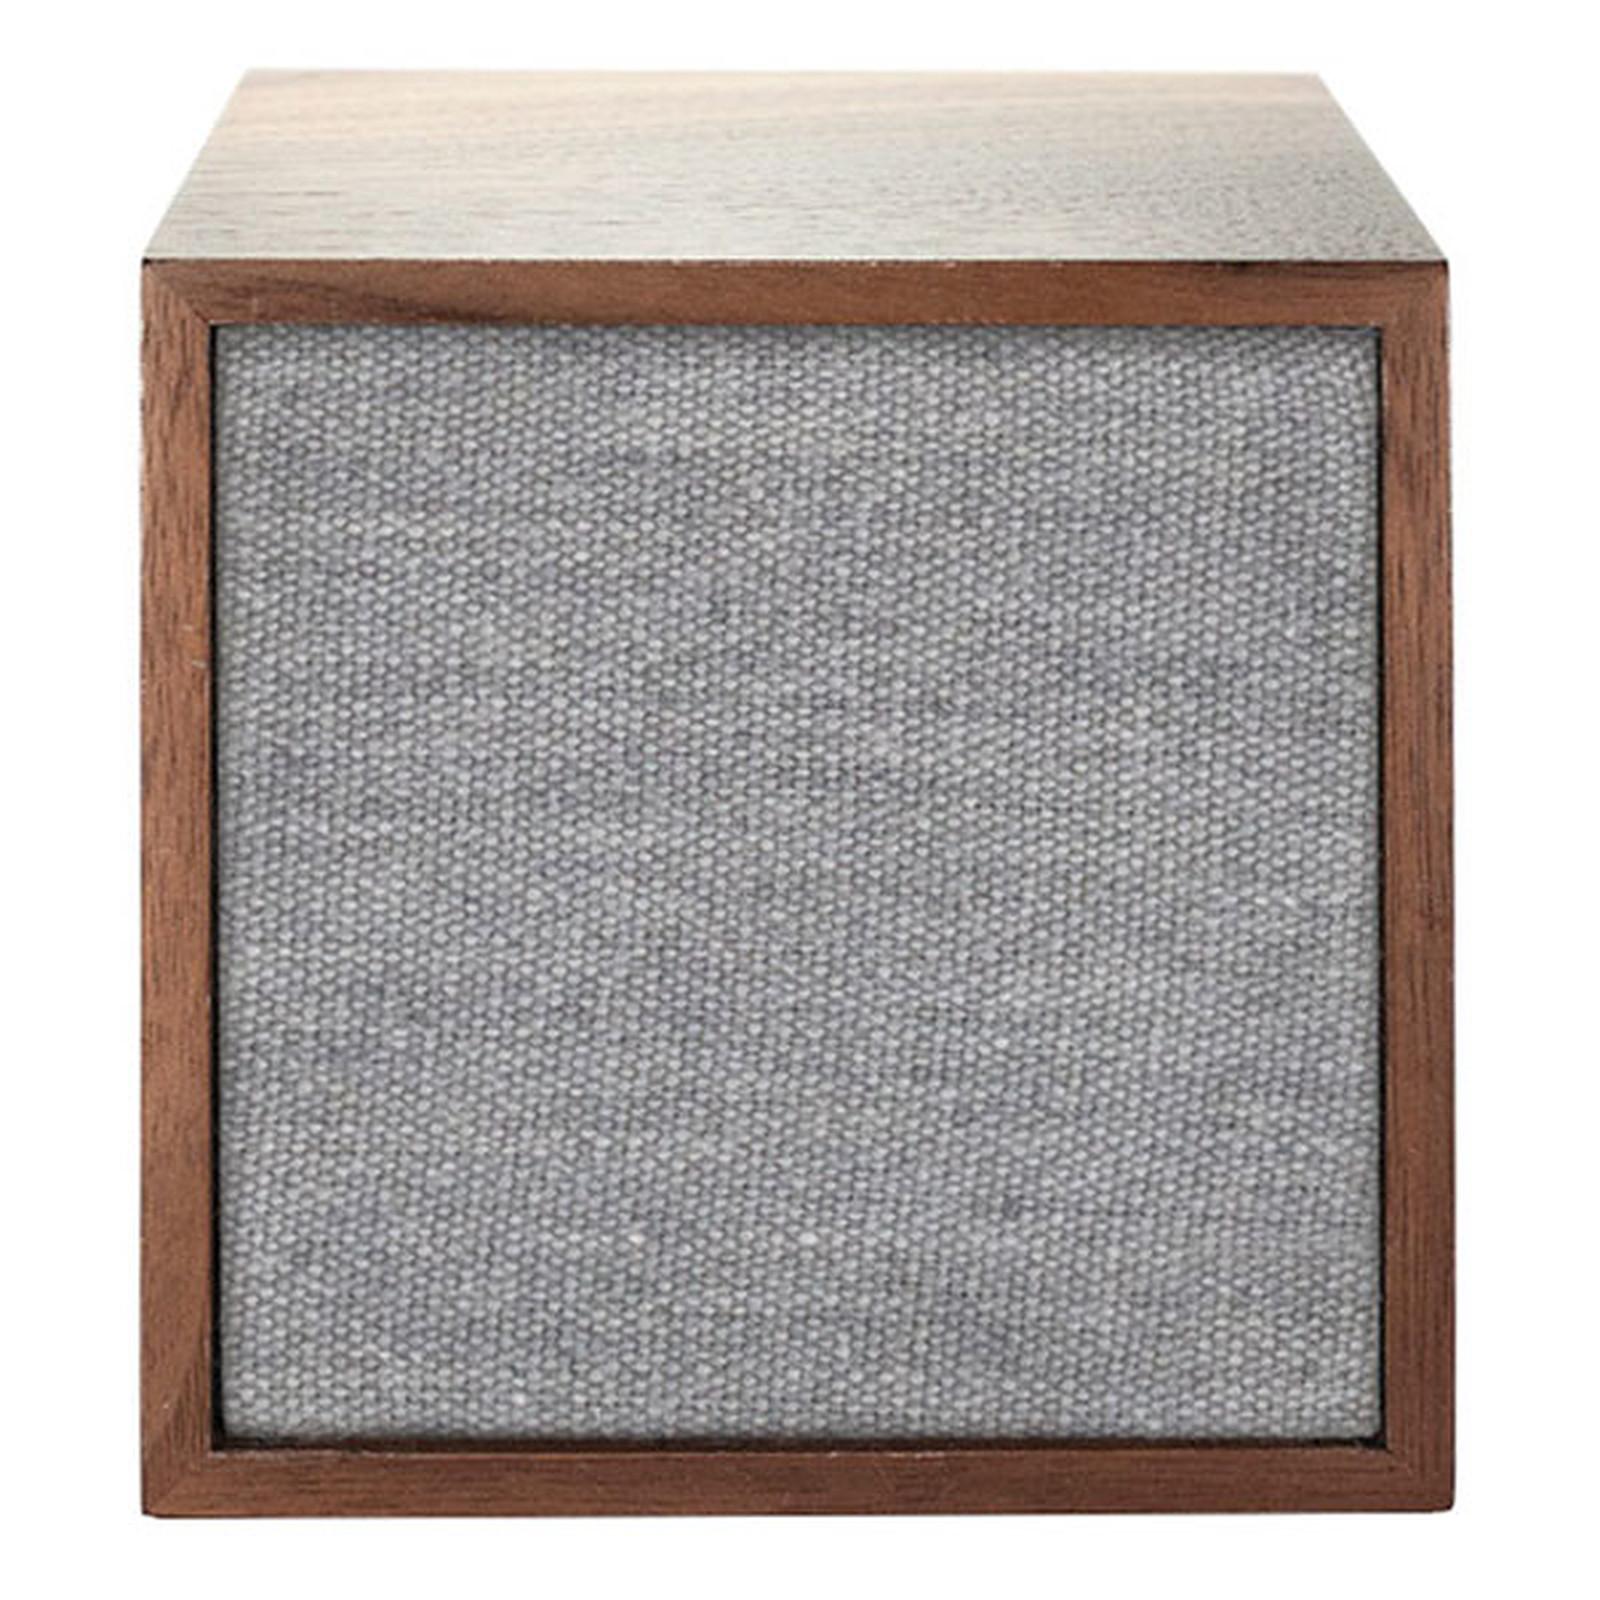 Tivoli Audio Cube Noyer / Gris